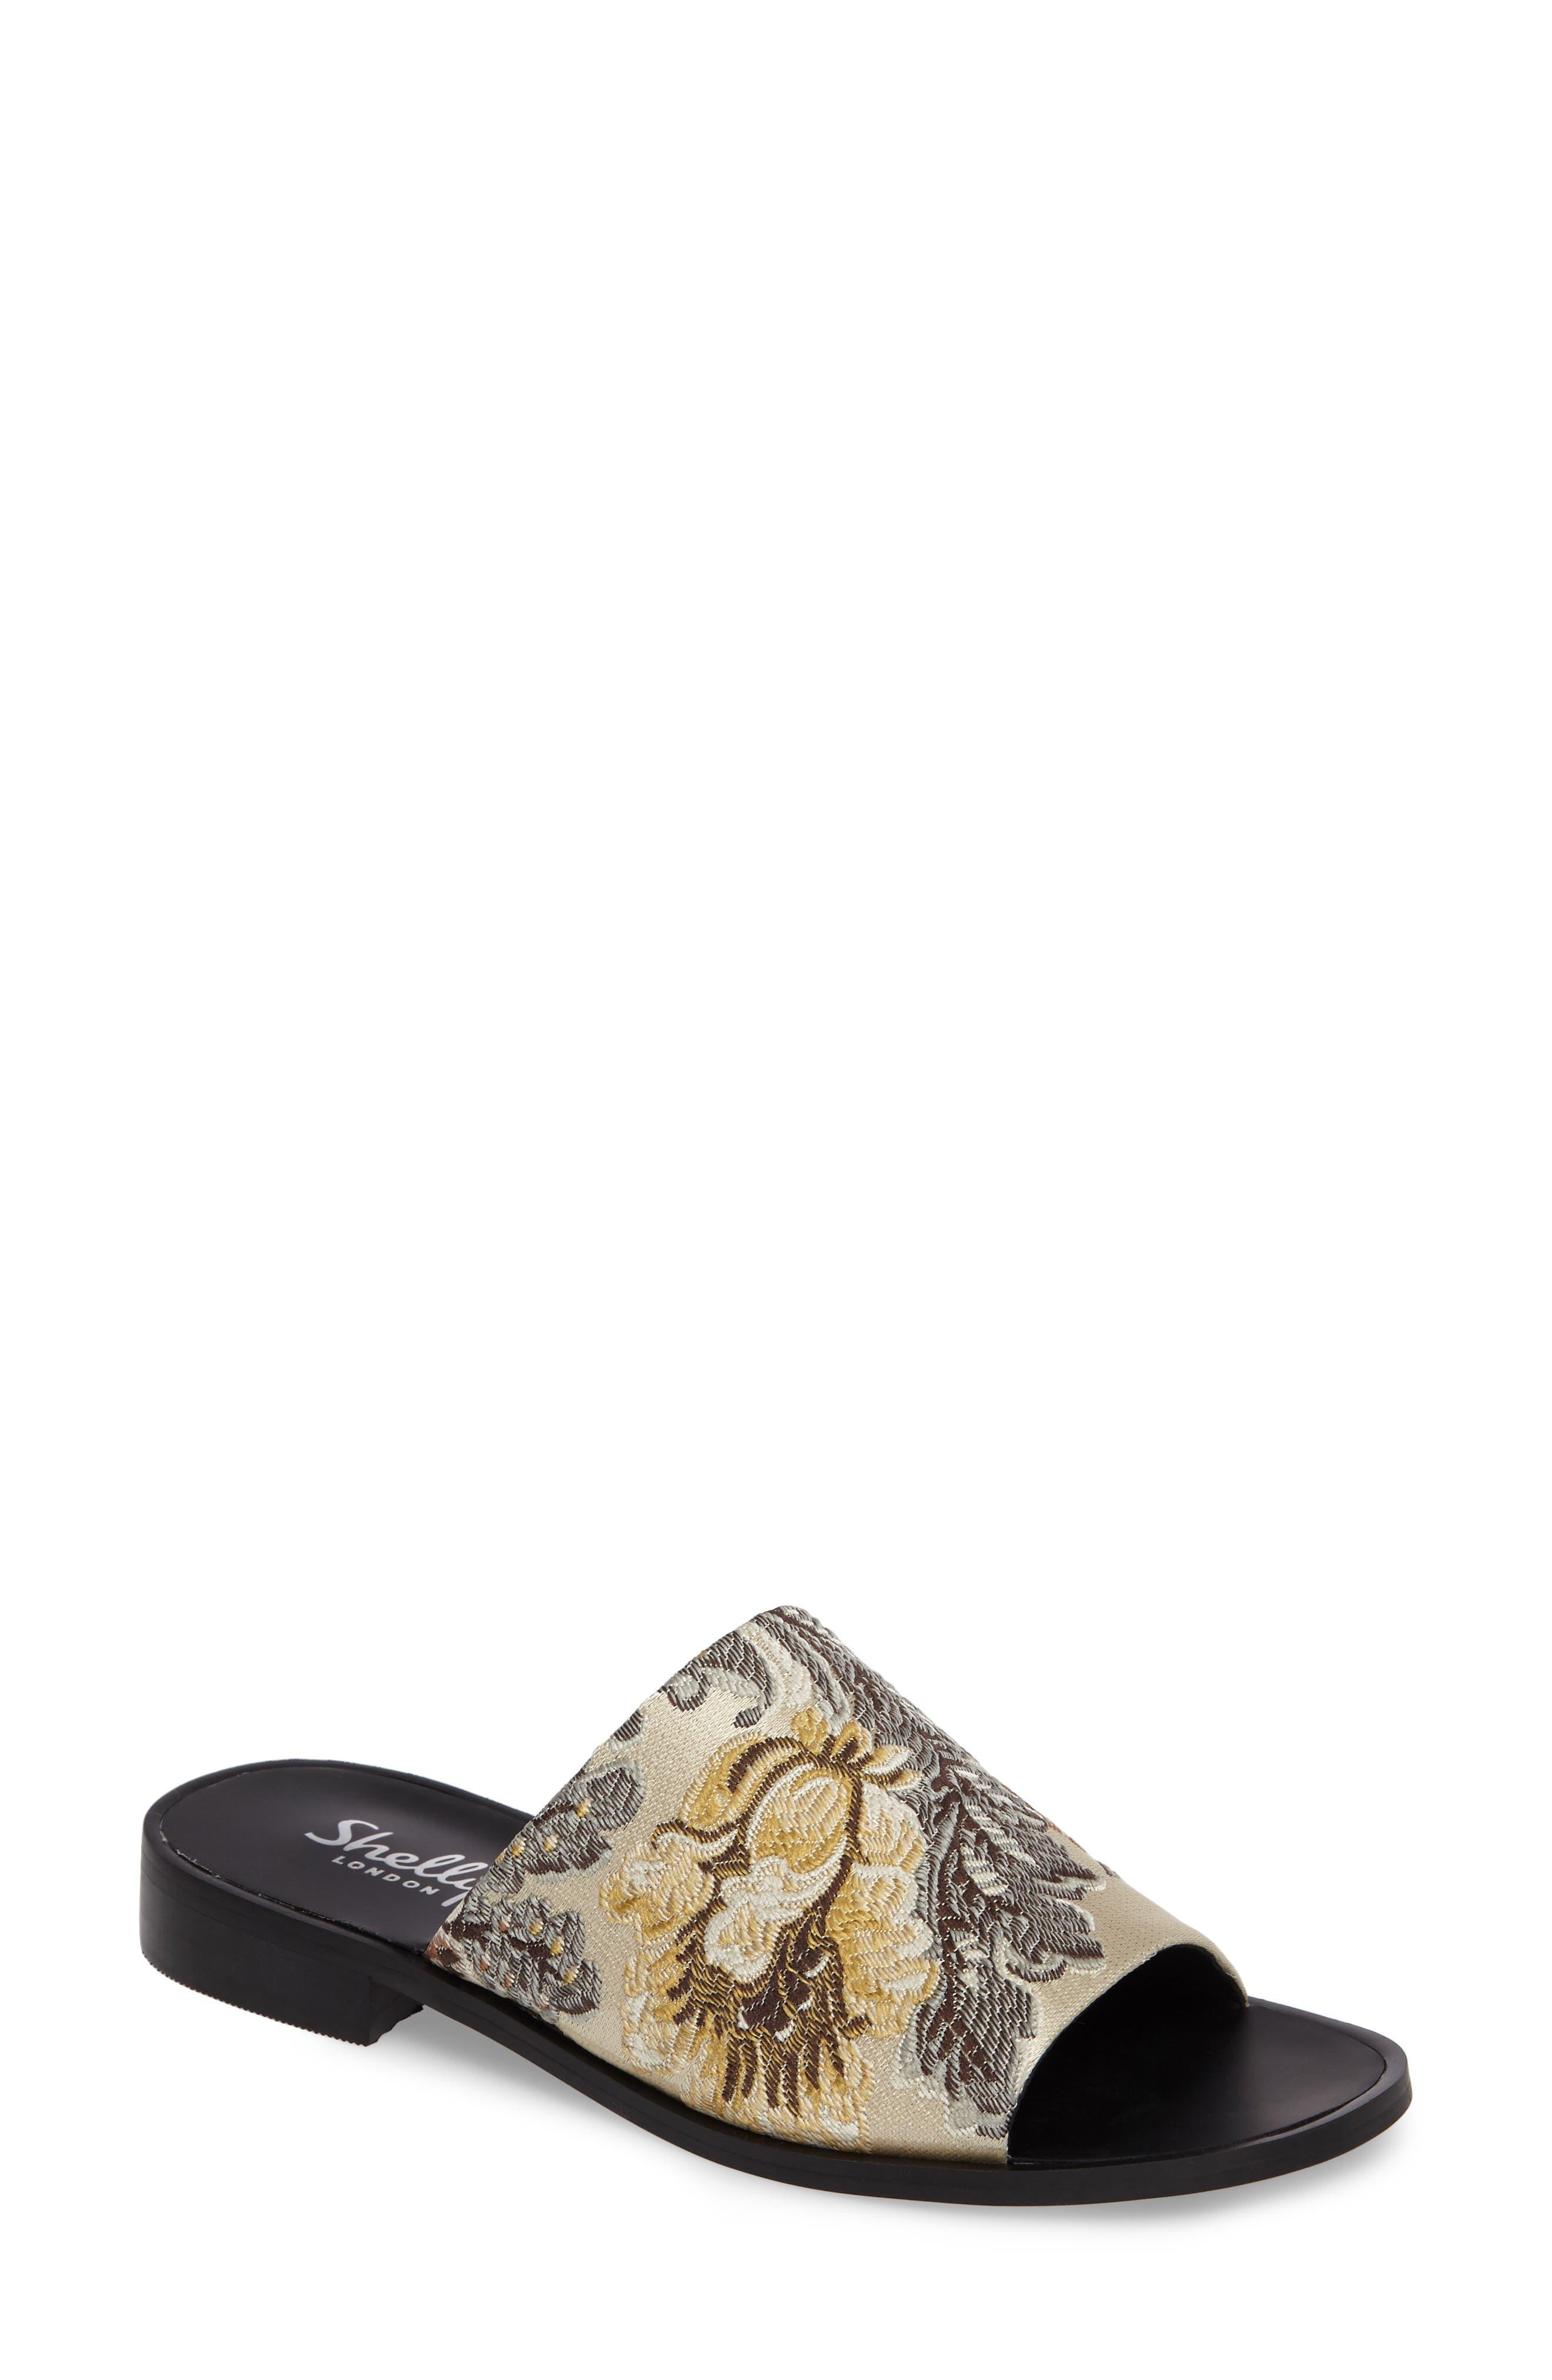 Main Image - Shellys London Enya Brocade Slide Sandal (Women)